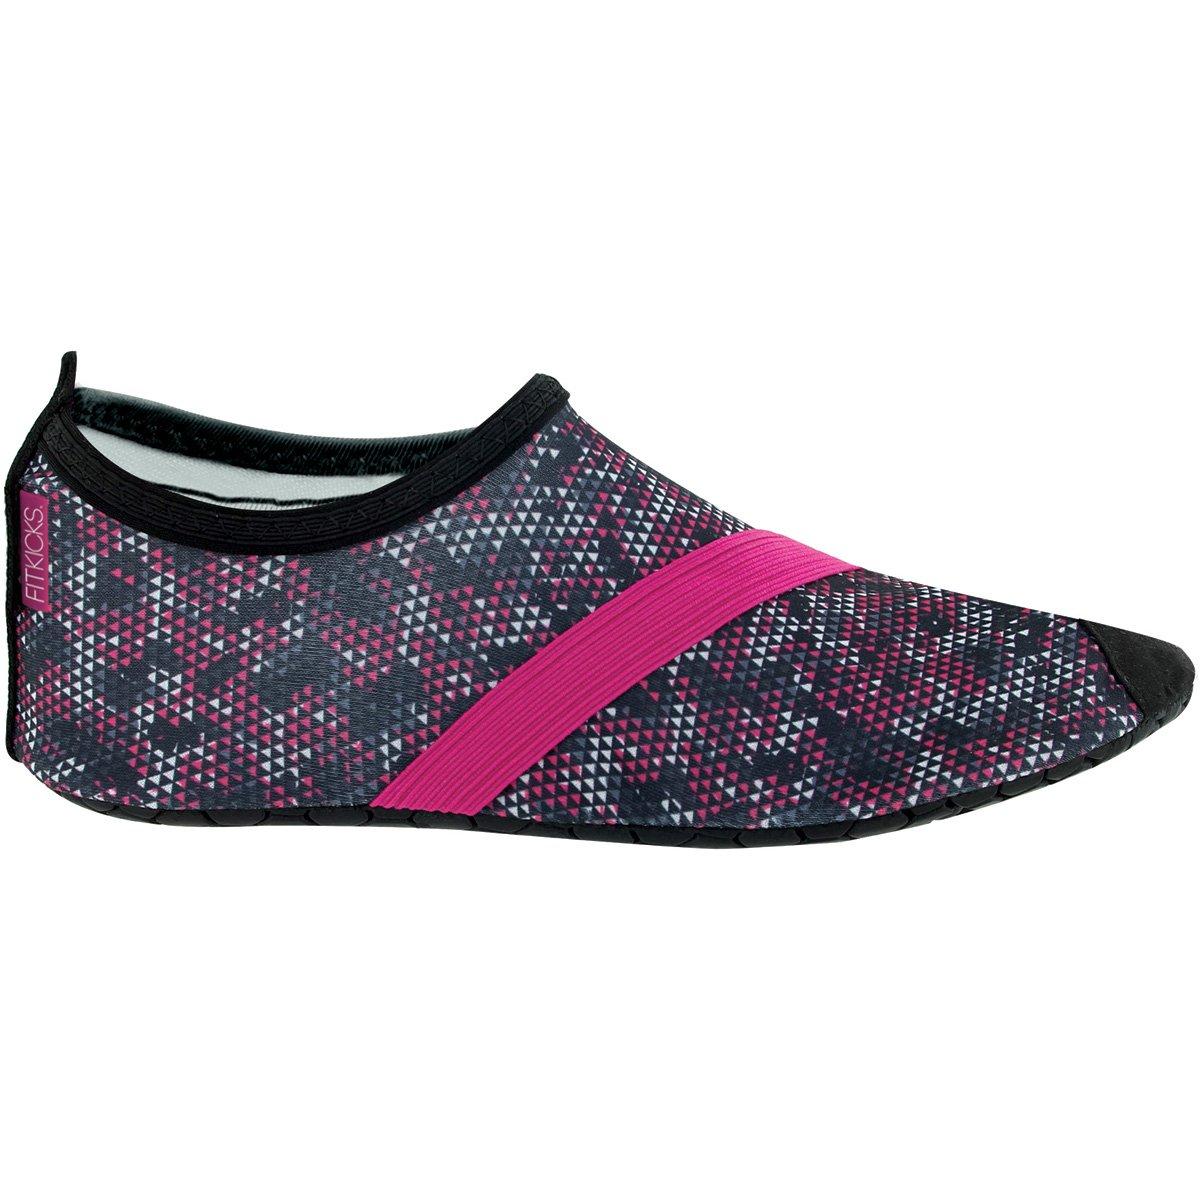 FitKicks Women's Active Footwear, Primal, Large